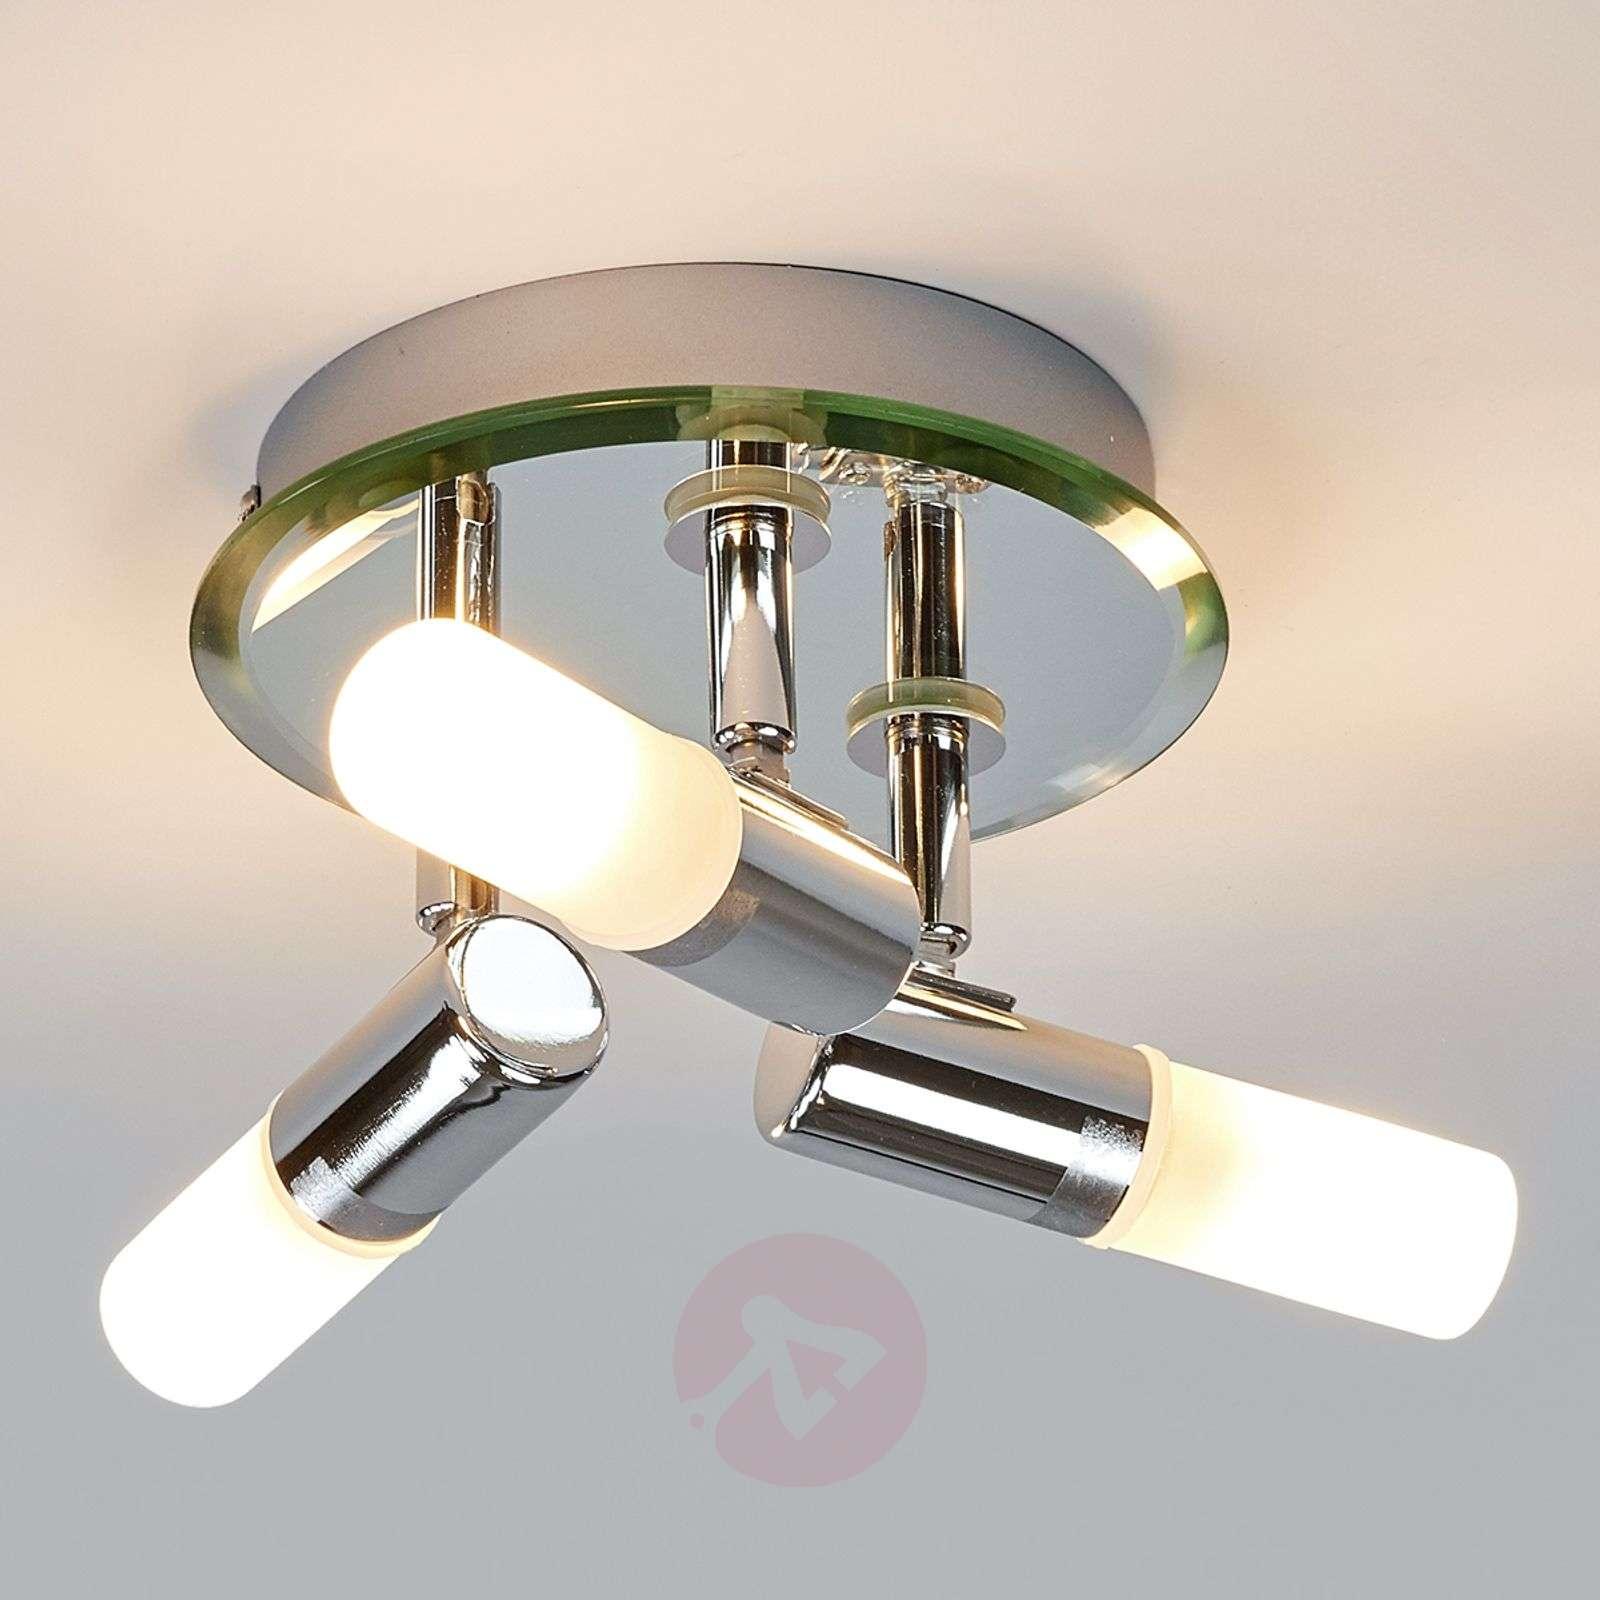 Jilian circular ceiling spotlight for bathrooms-9634030-09